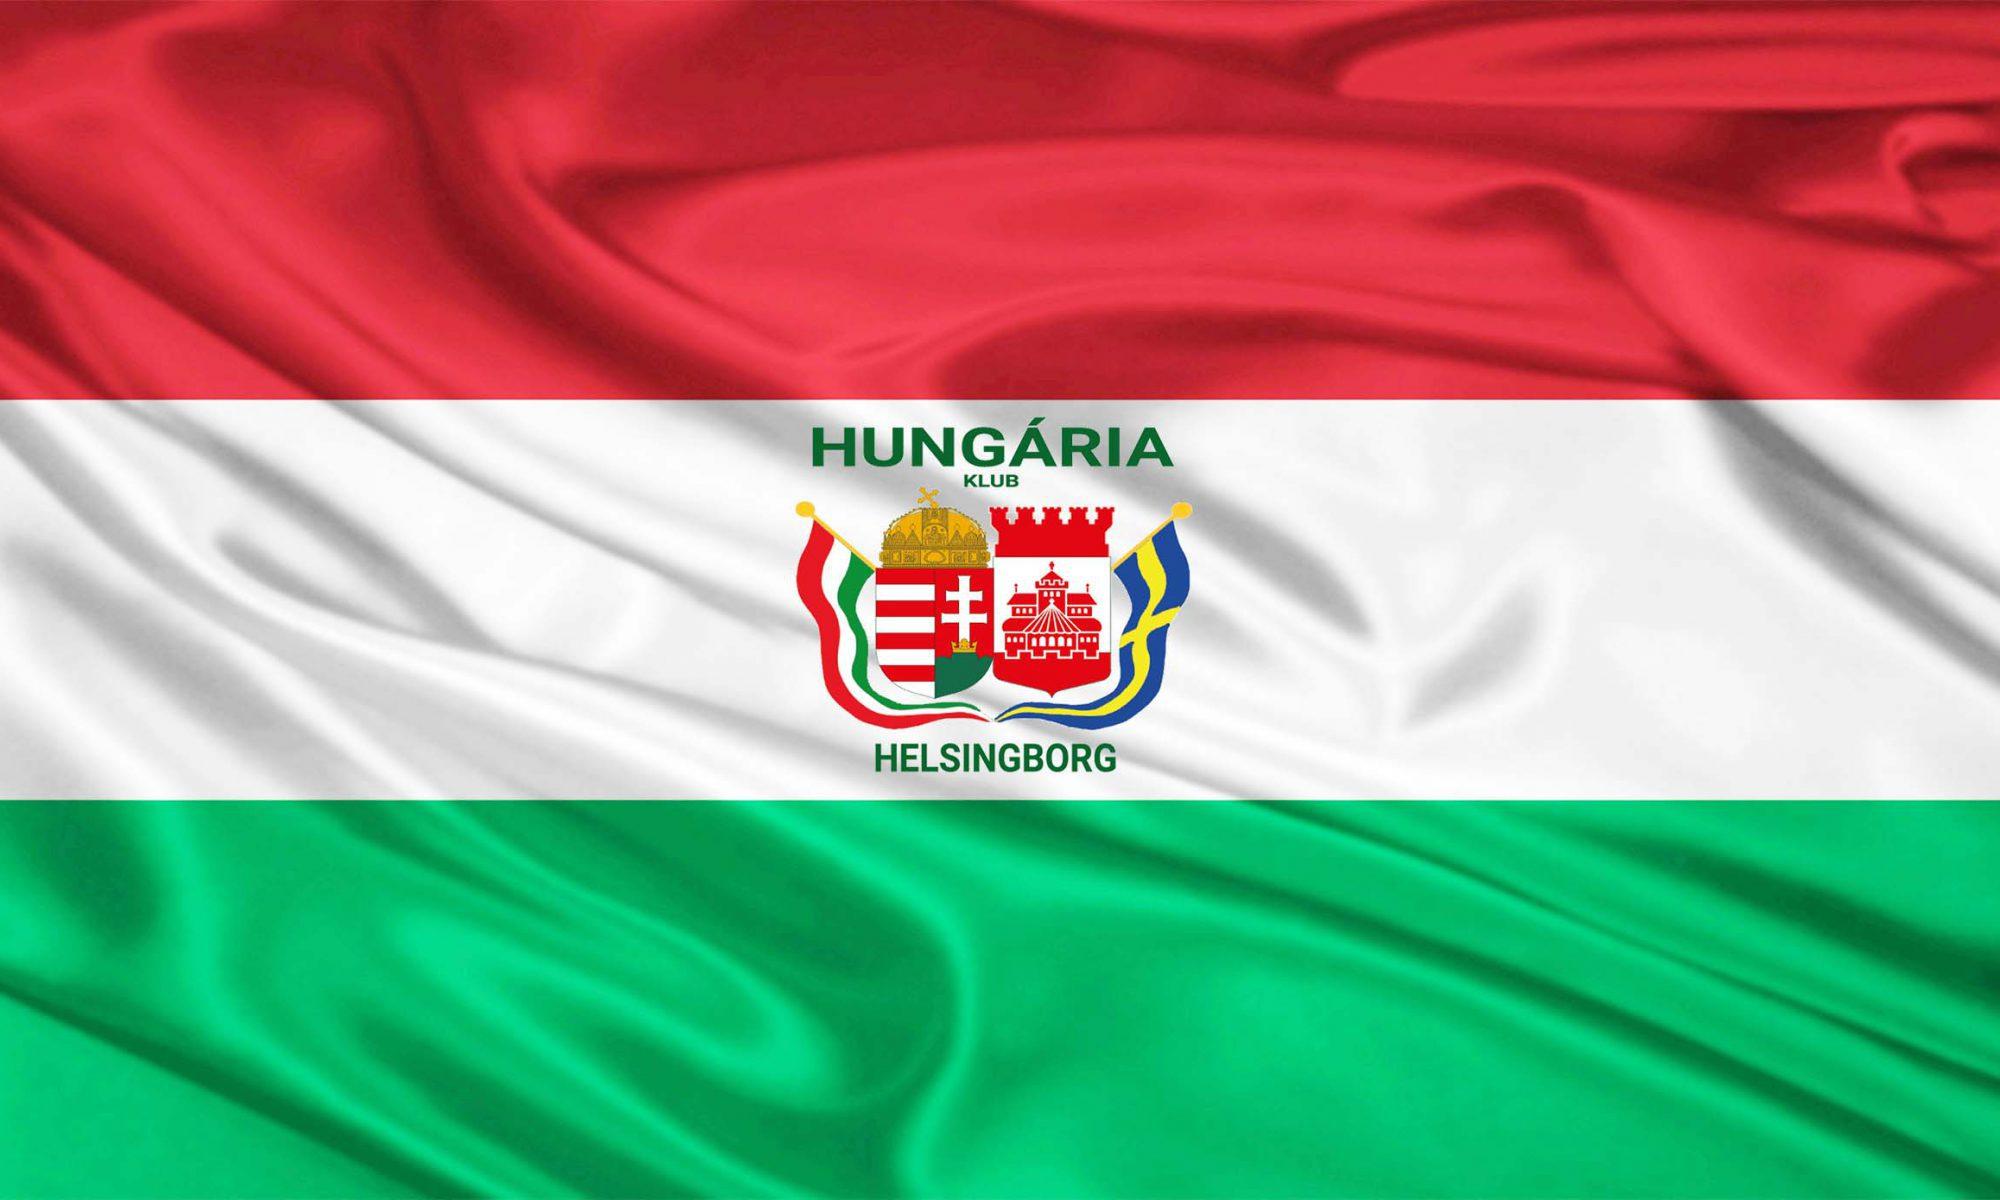 Helsingborgi Hungária Klub